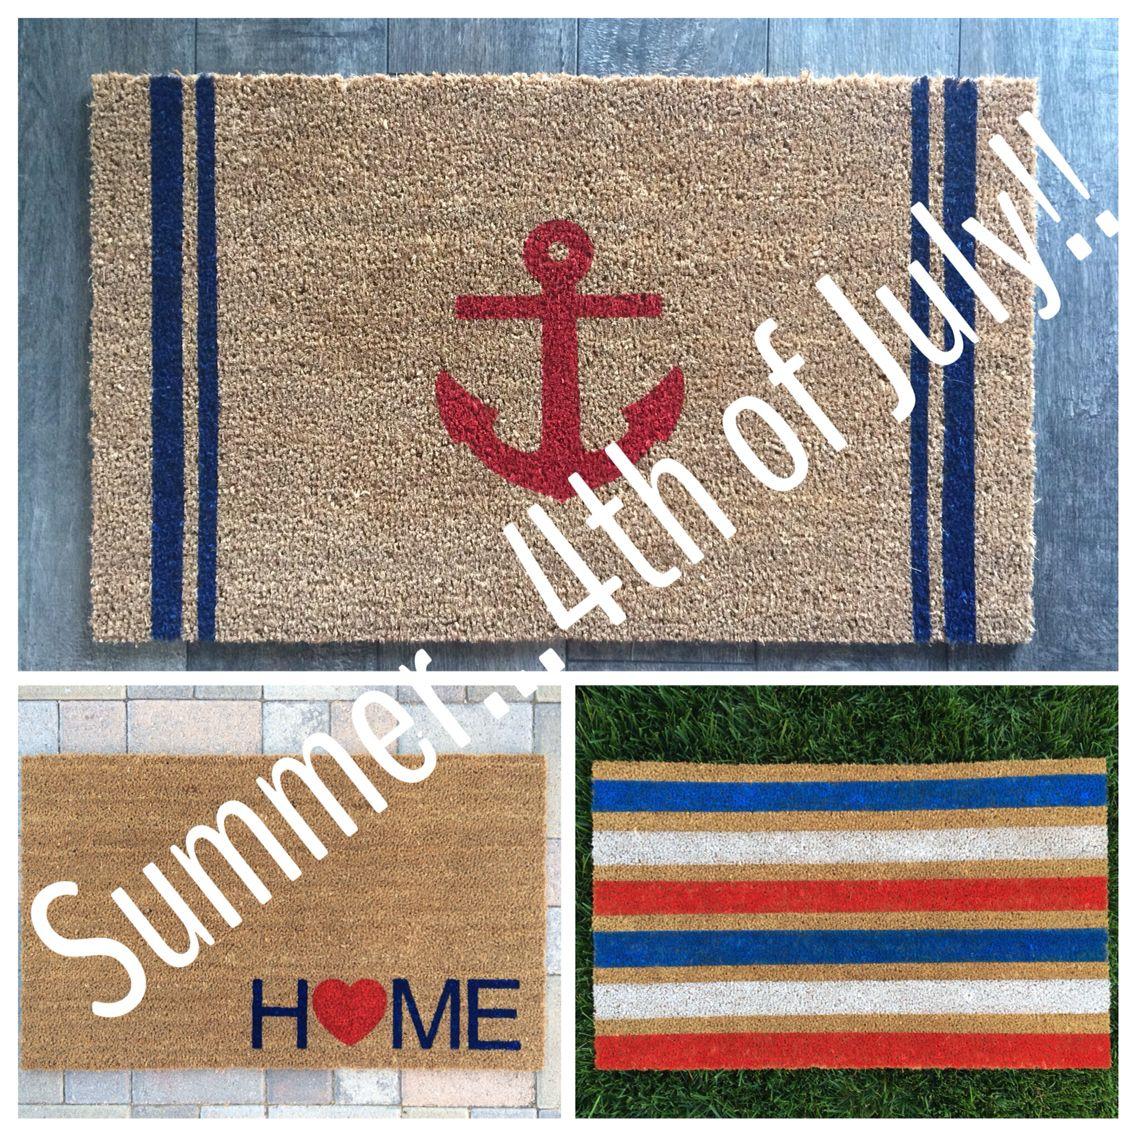 welcome mat especial funny ideas widest family avhmbb range magnificent mats similiar door customized plus decorations doormats brilliant ga custom patio outdoor keywords